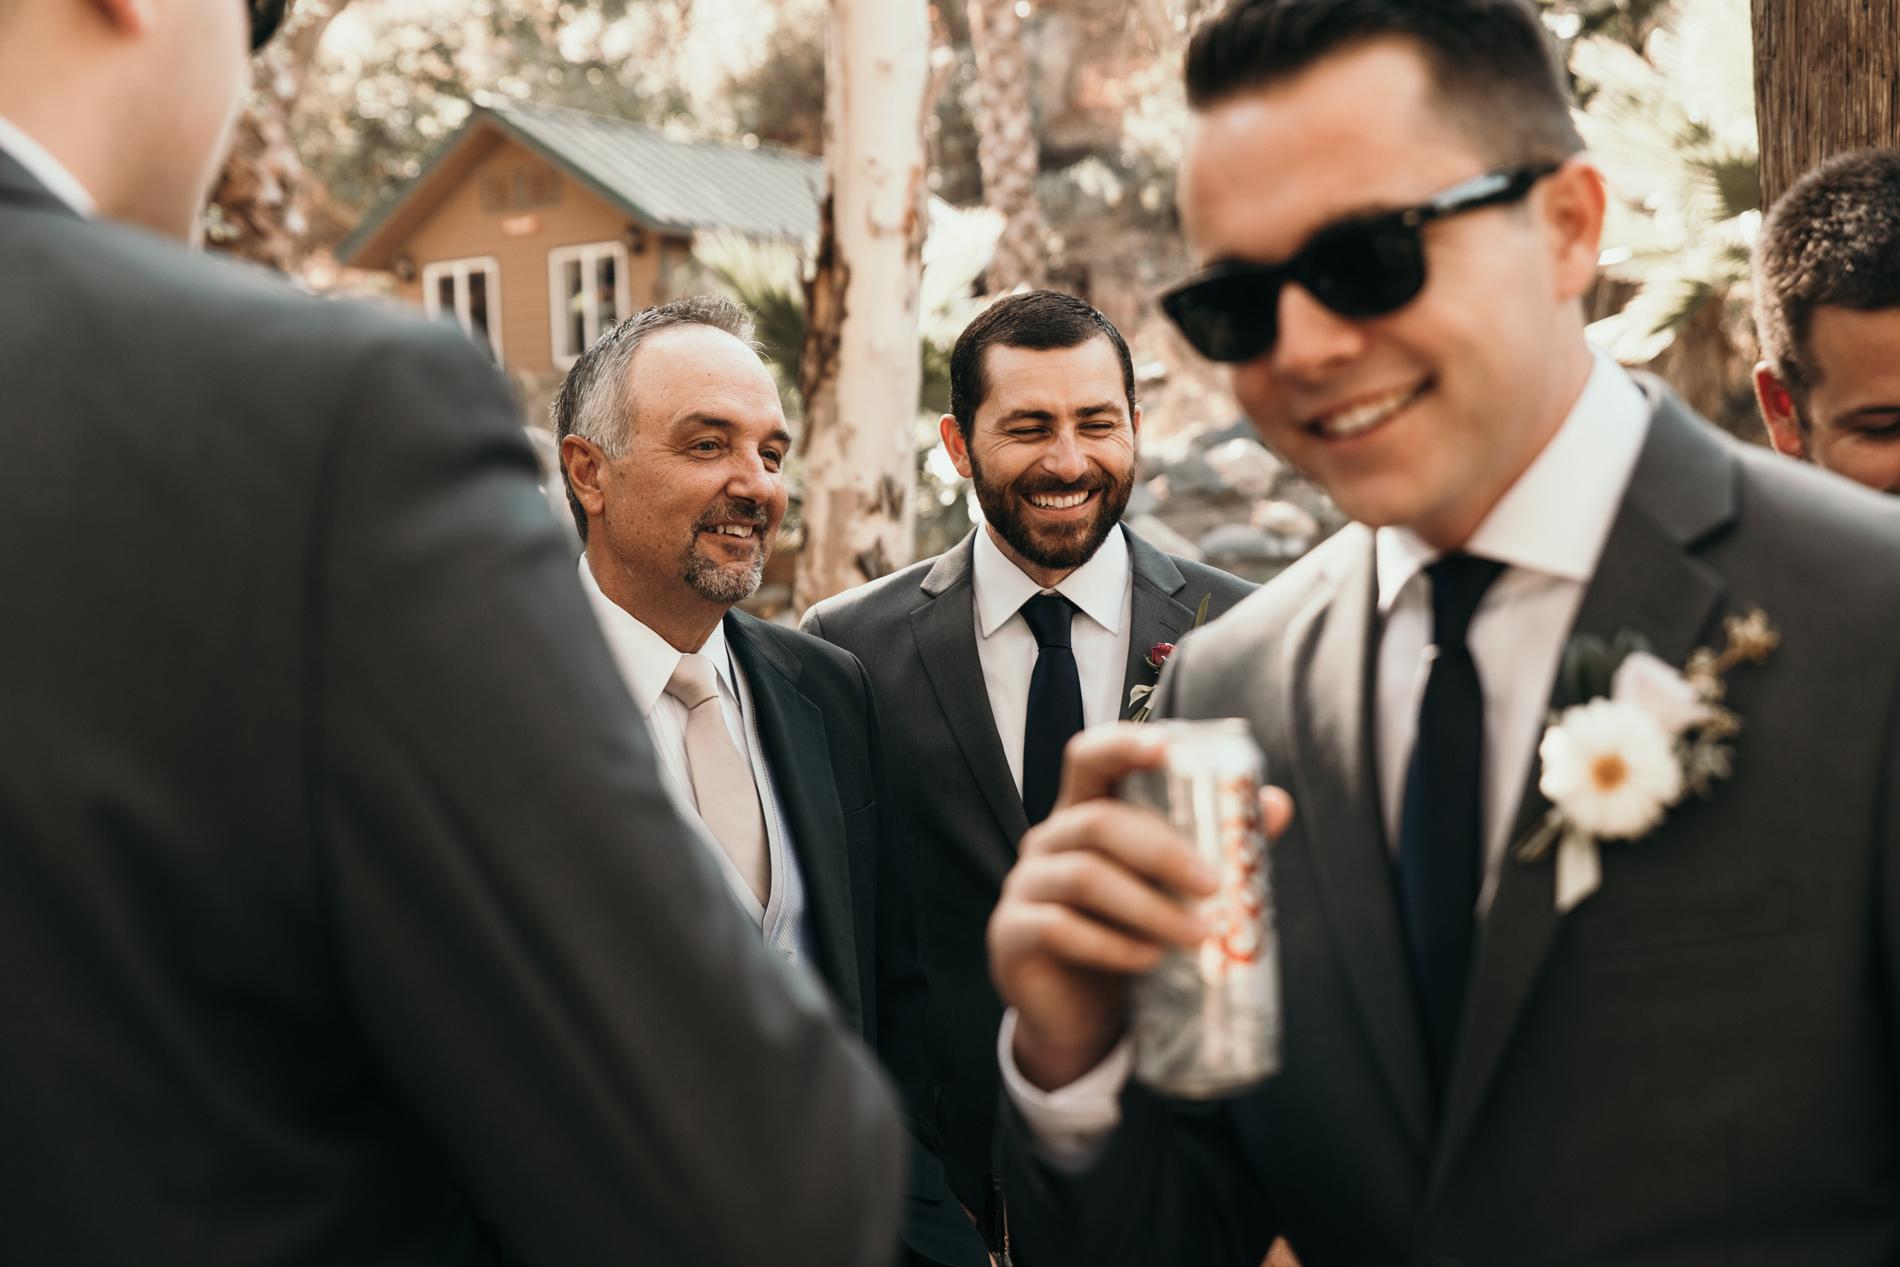 weddingphotos.jpg